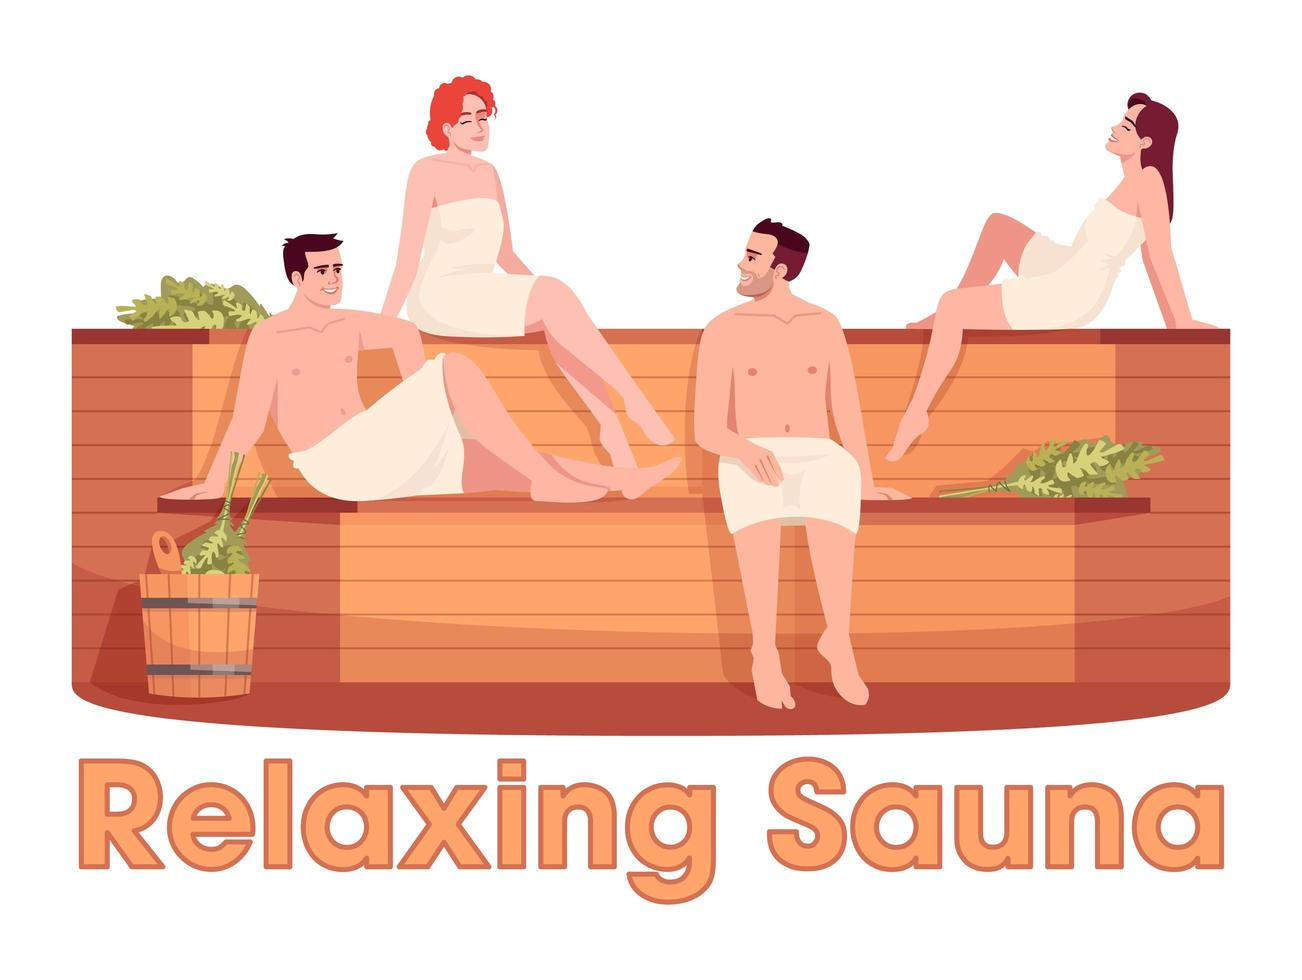 sauna finlandesa semi plana cor rgb vetor